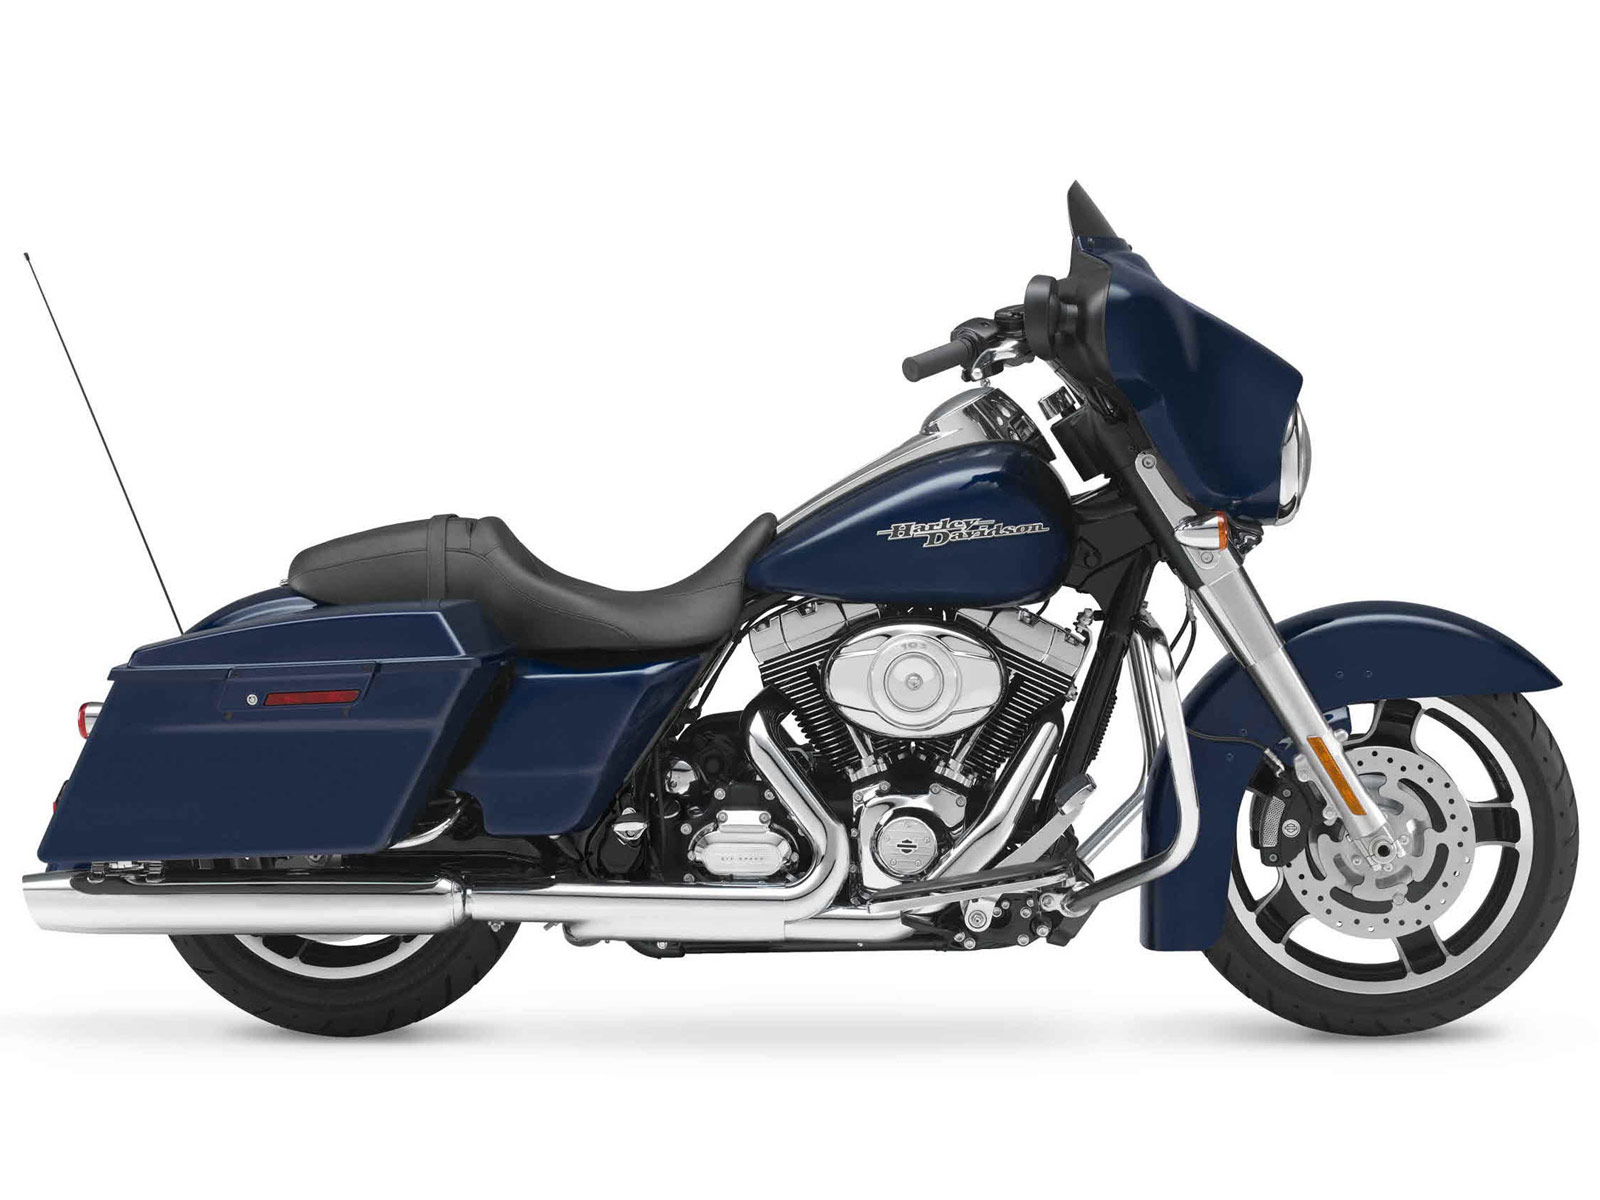 Harley Davidson 2012: 2012 Harley Davidson FLHX Street Glide Pictures